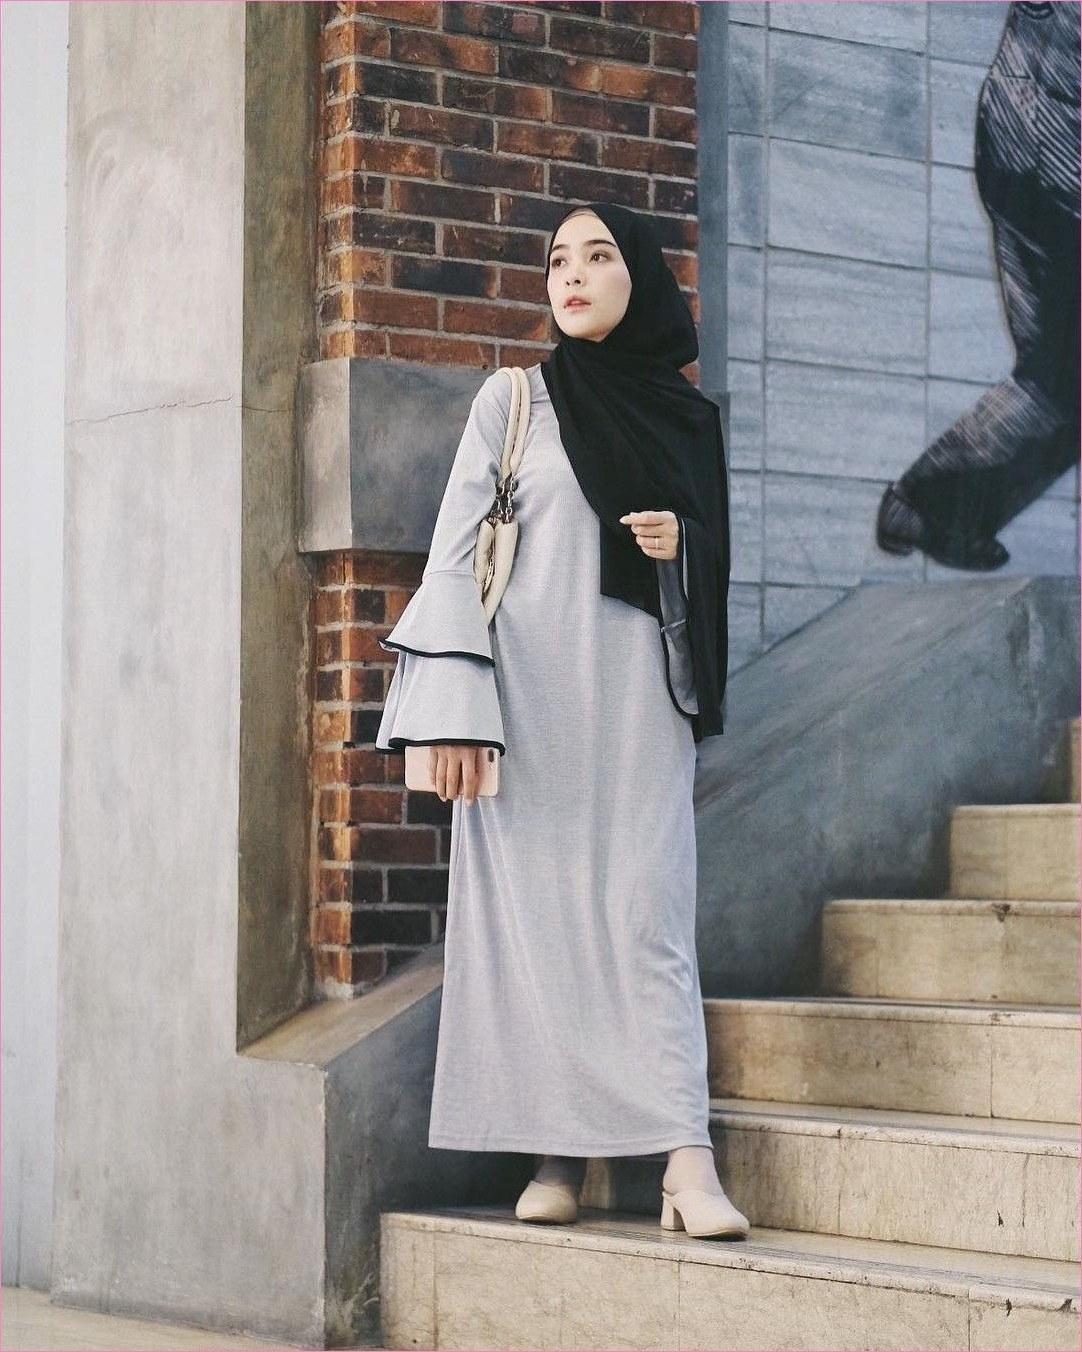 Design Baju Lebaran Simpel Rldj Outfit Baju Remaja Berhijab Ala Selebgram 2018 Pashmina